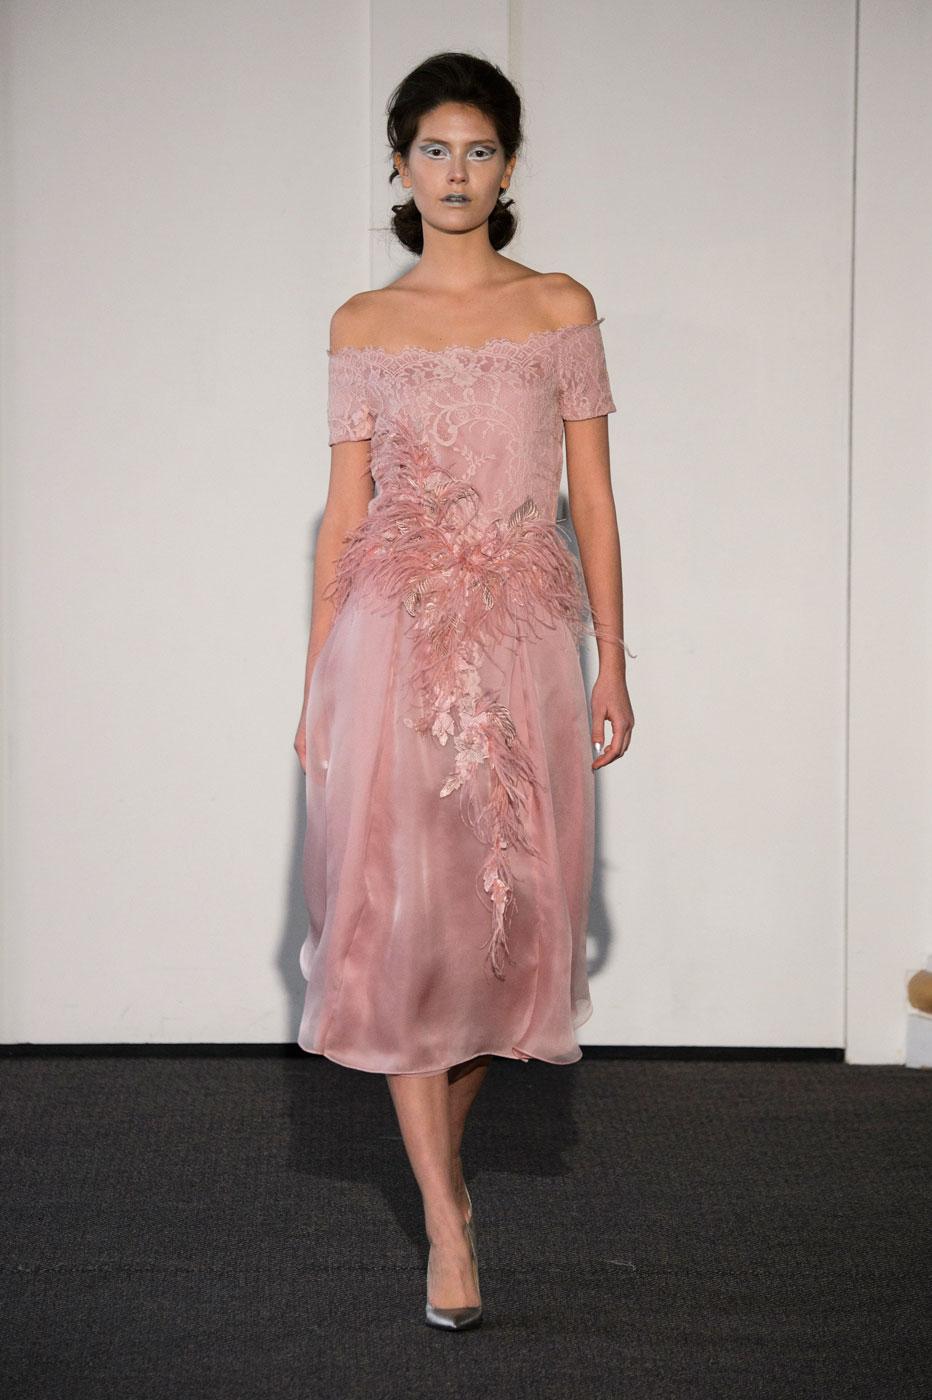 Busardi-fashion-runway-show-haute-couture-paris-spring-2015-the-impression-37